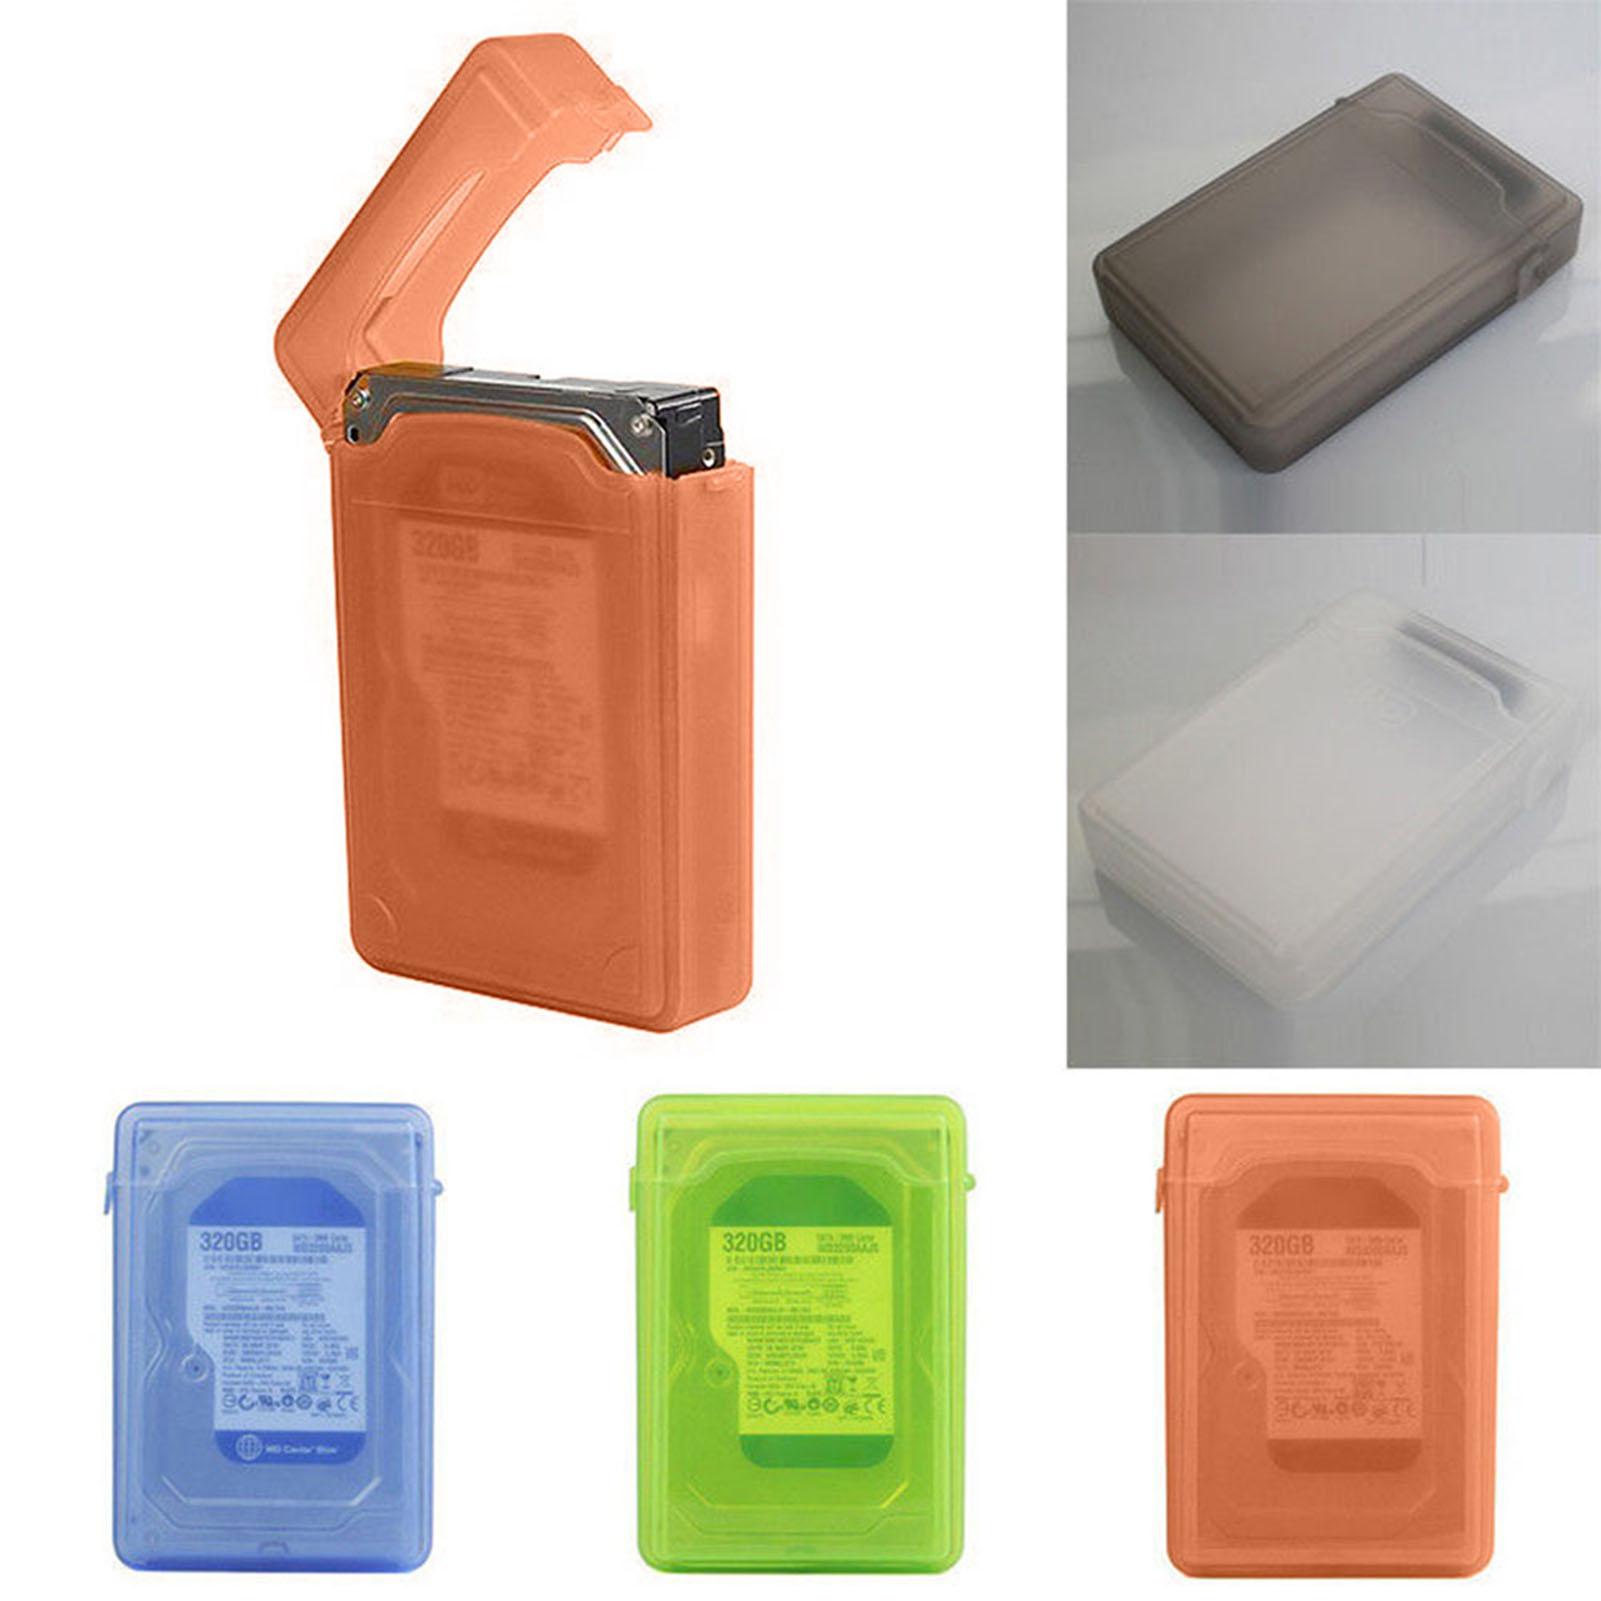 Protection-Plastic-Storage-Box-Case-Enclosure-for-3-5-039-039-SATA-HDD-Hard-Drive-Disk thumbnail 3